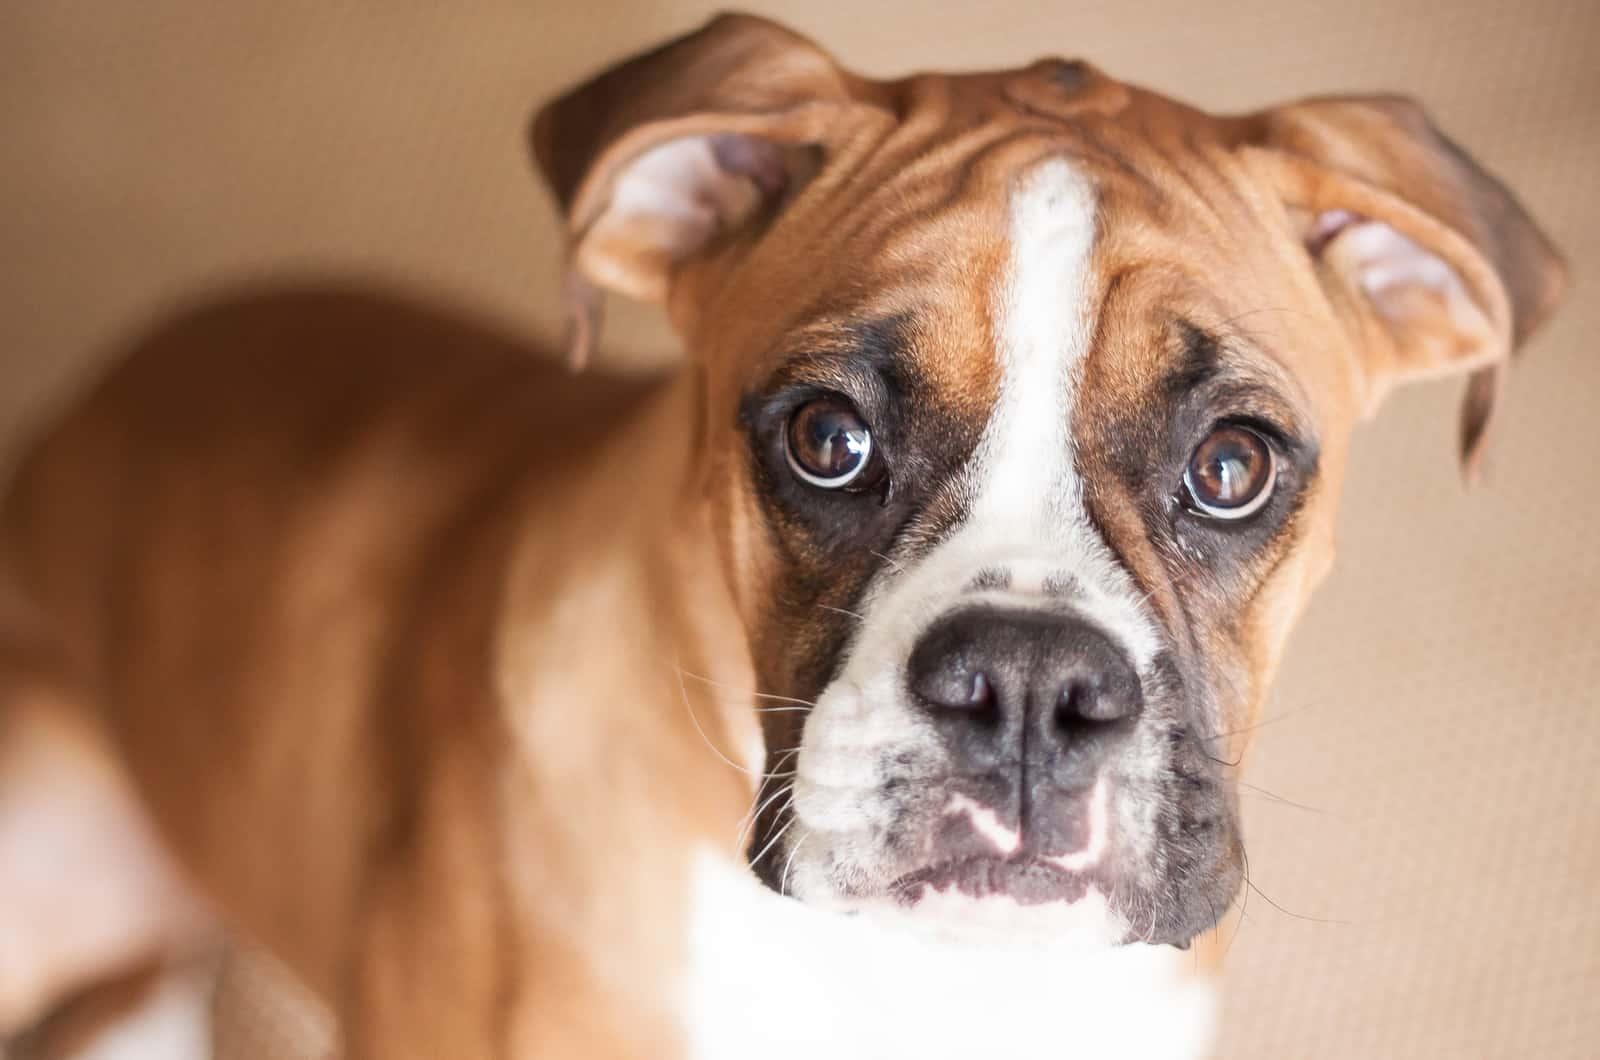 boxer puppy close-up photograph